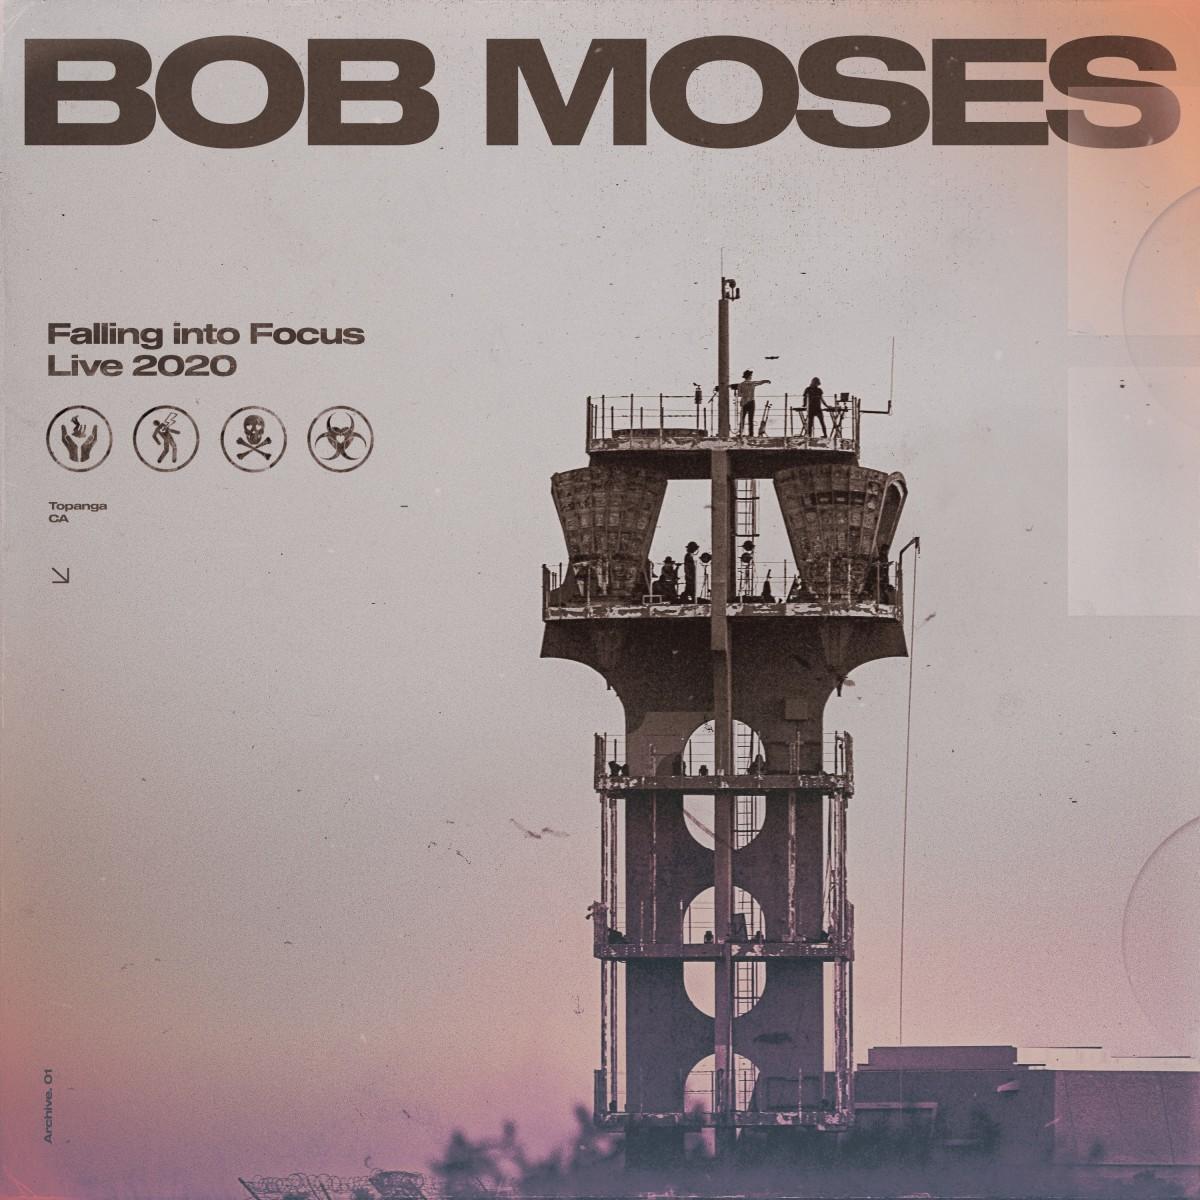 BOB MOSES - FALLING INTO FOCUS - LIVE 2020 - COUVERTURE DE L'ALBUM